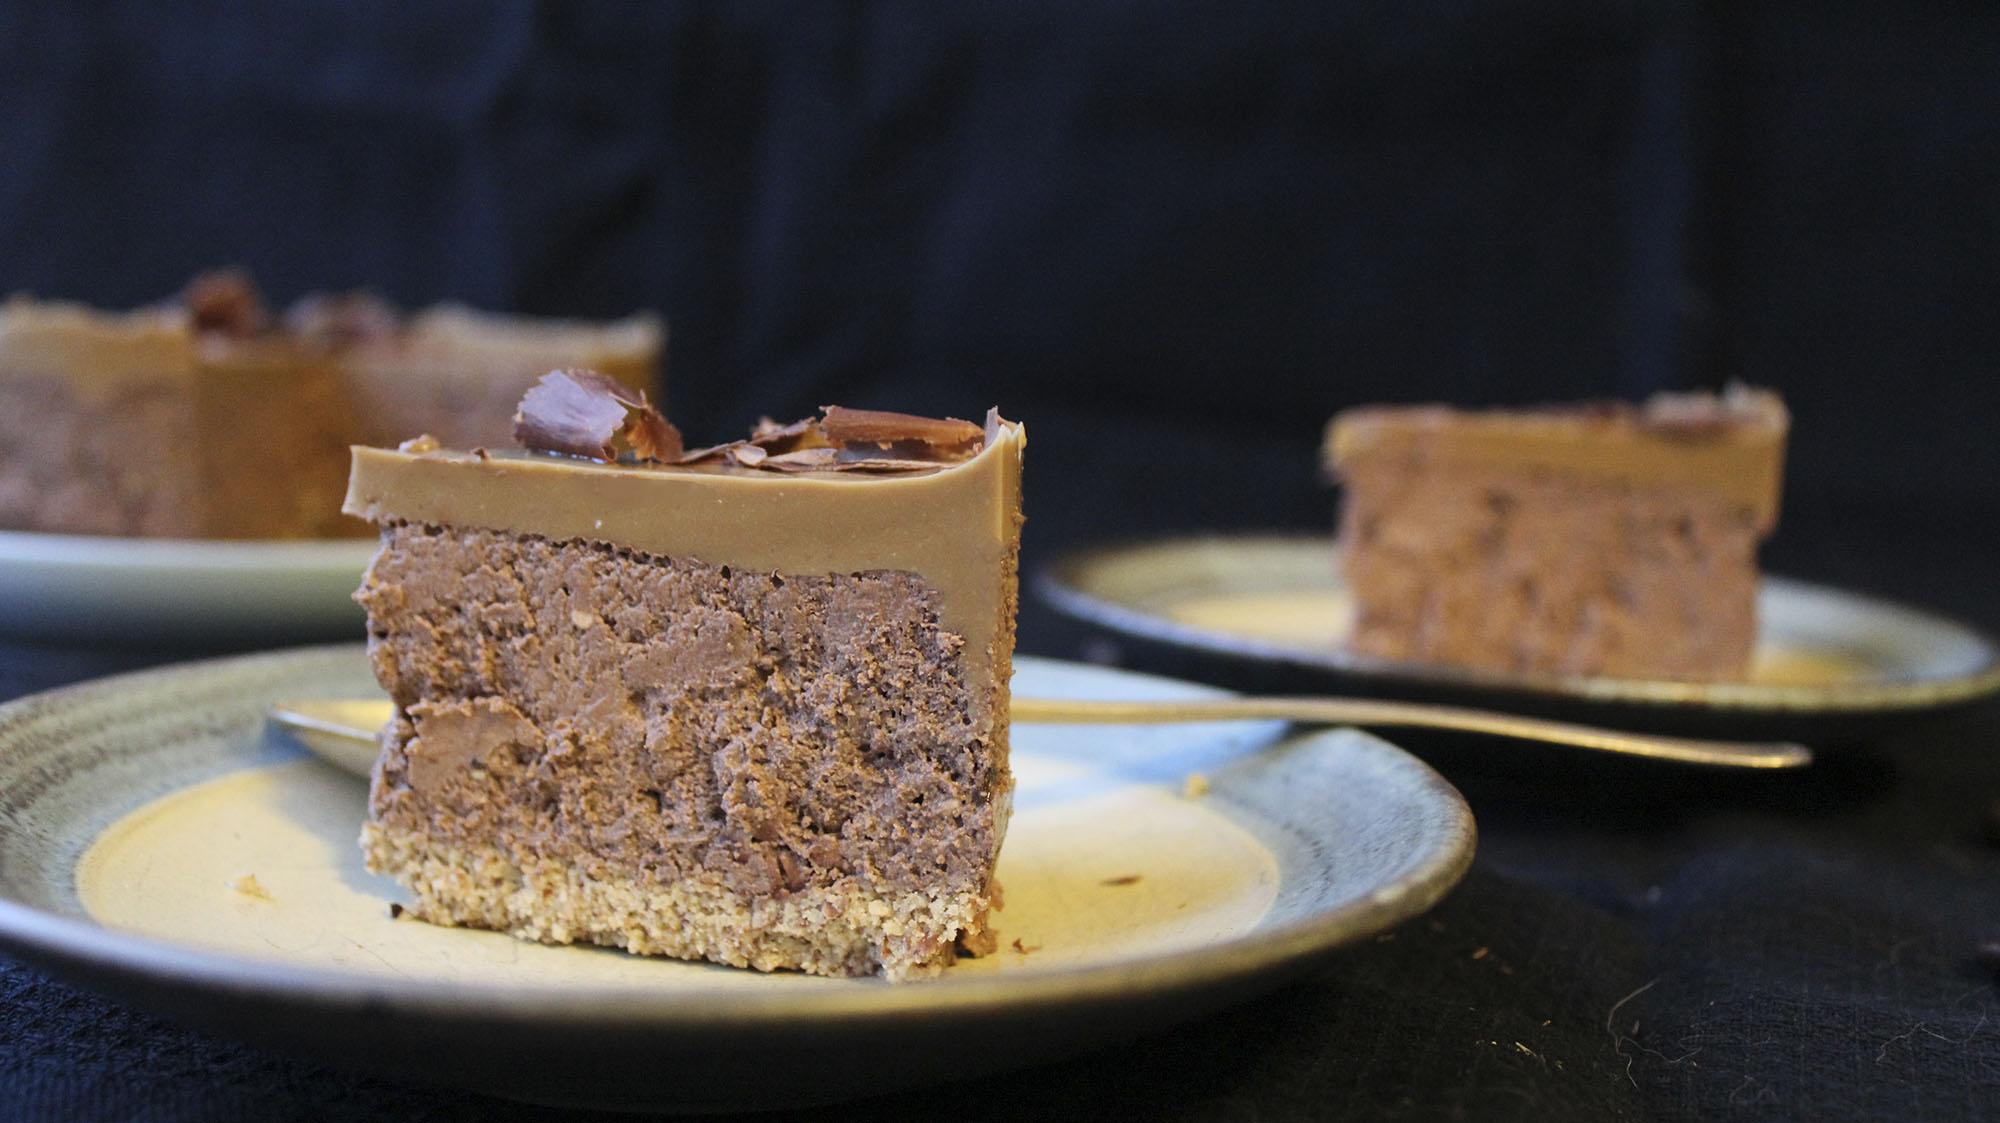 Chokolade-kaffe cheesecake (LCHF)